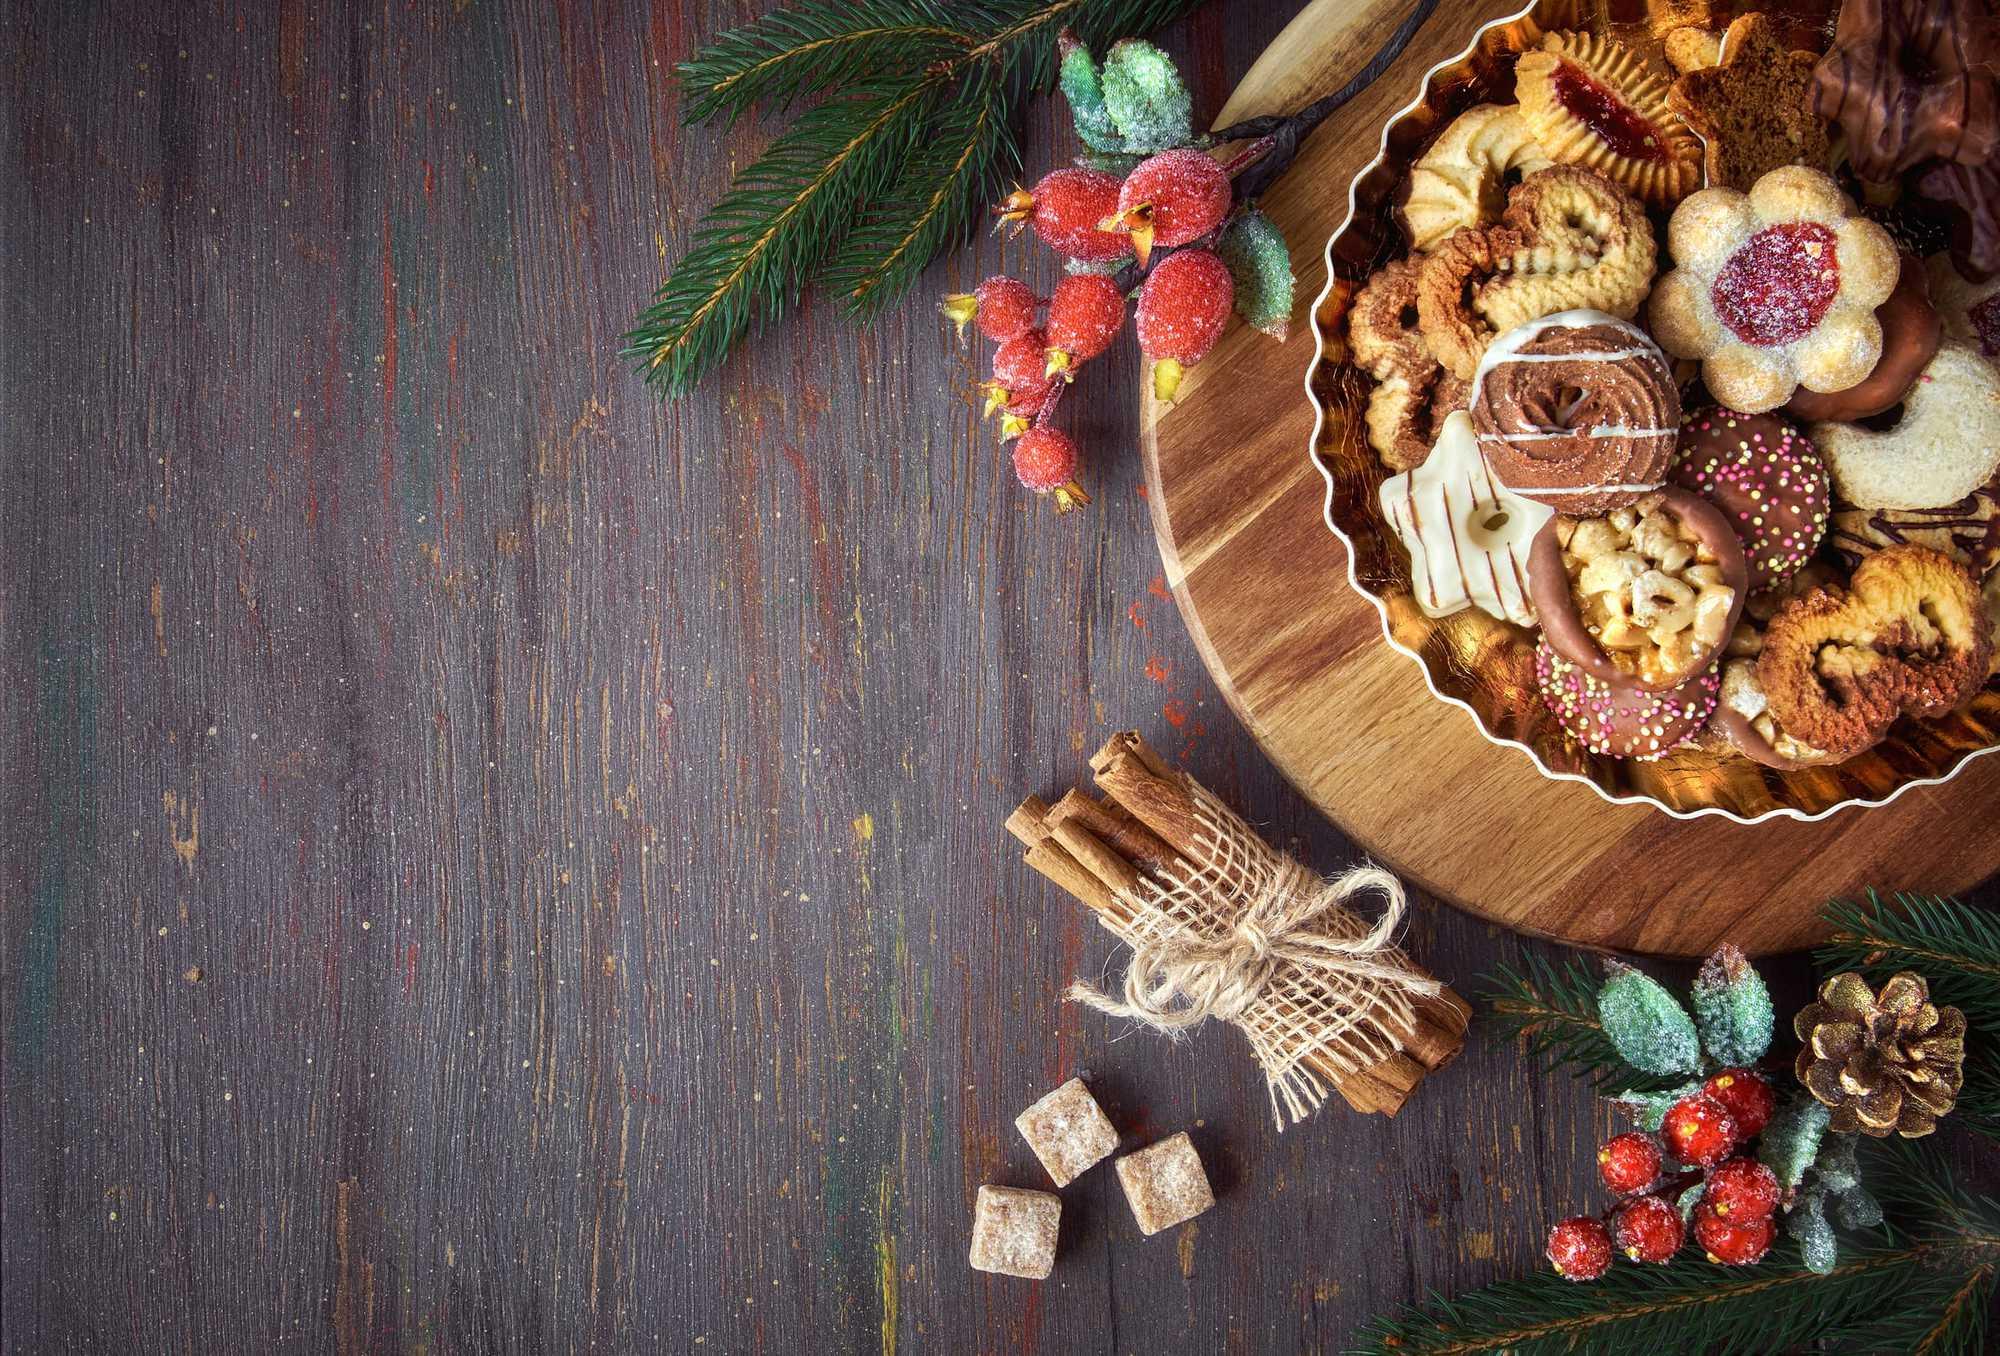 Weihnachtskekse auf Holzbrett